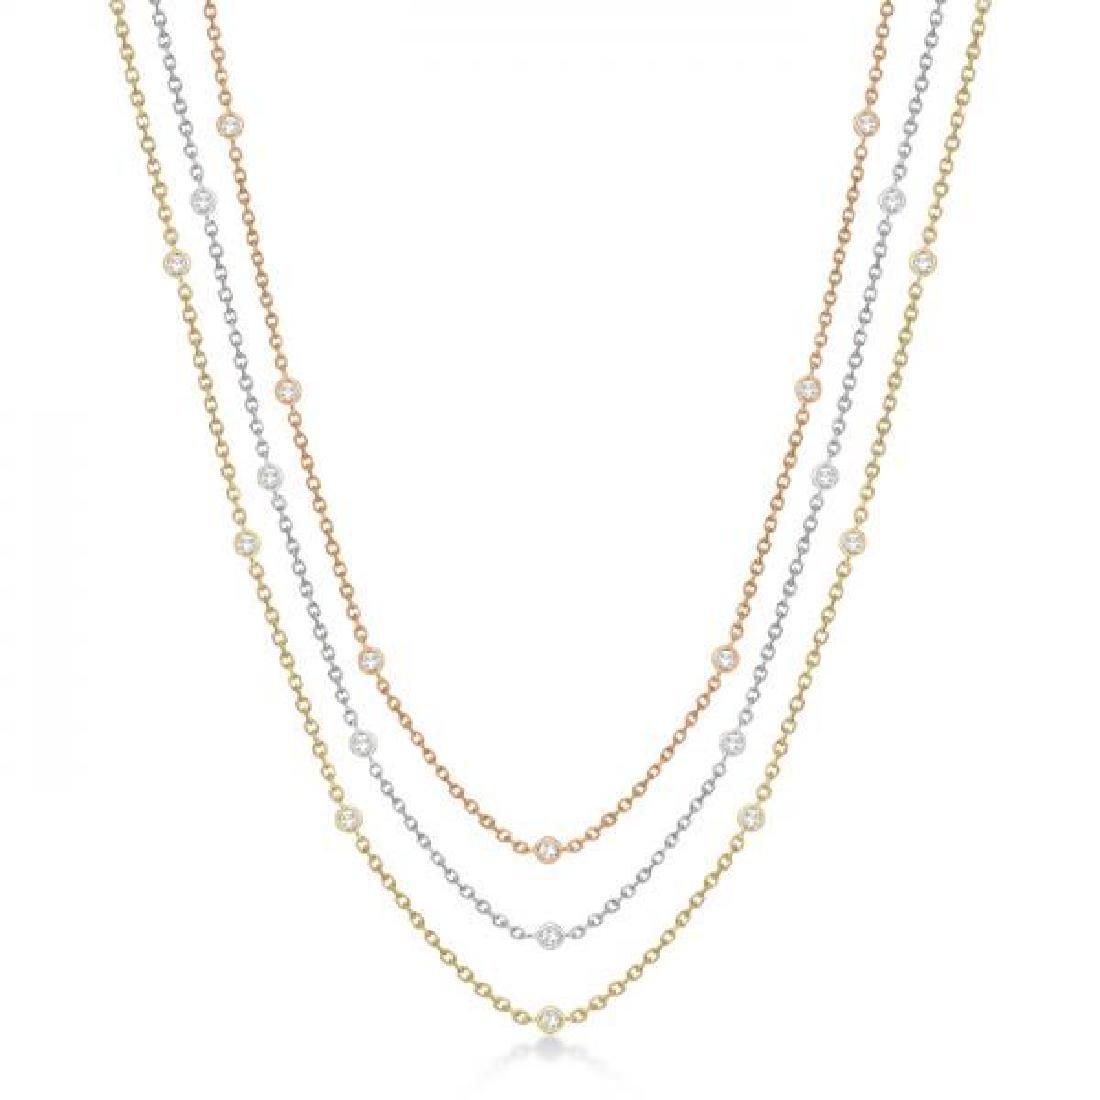 Three-Strand Diamond Station Necklace in 14k Three-Tone